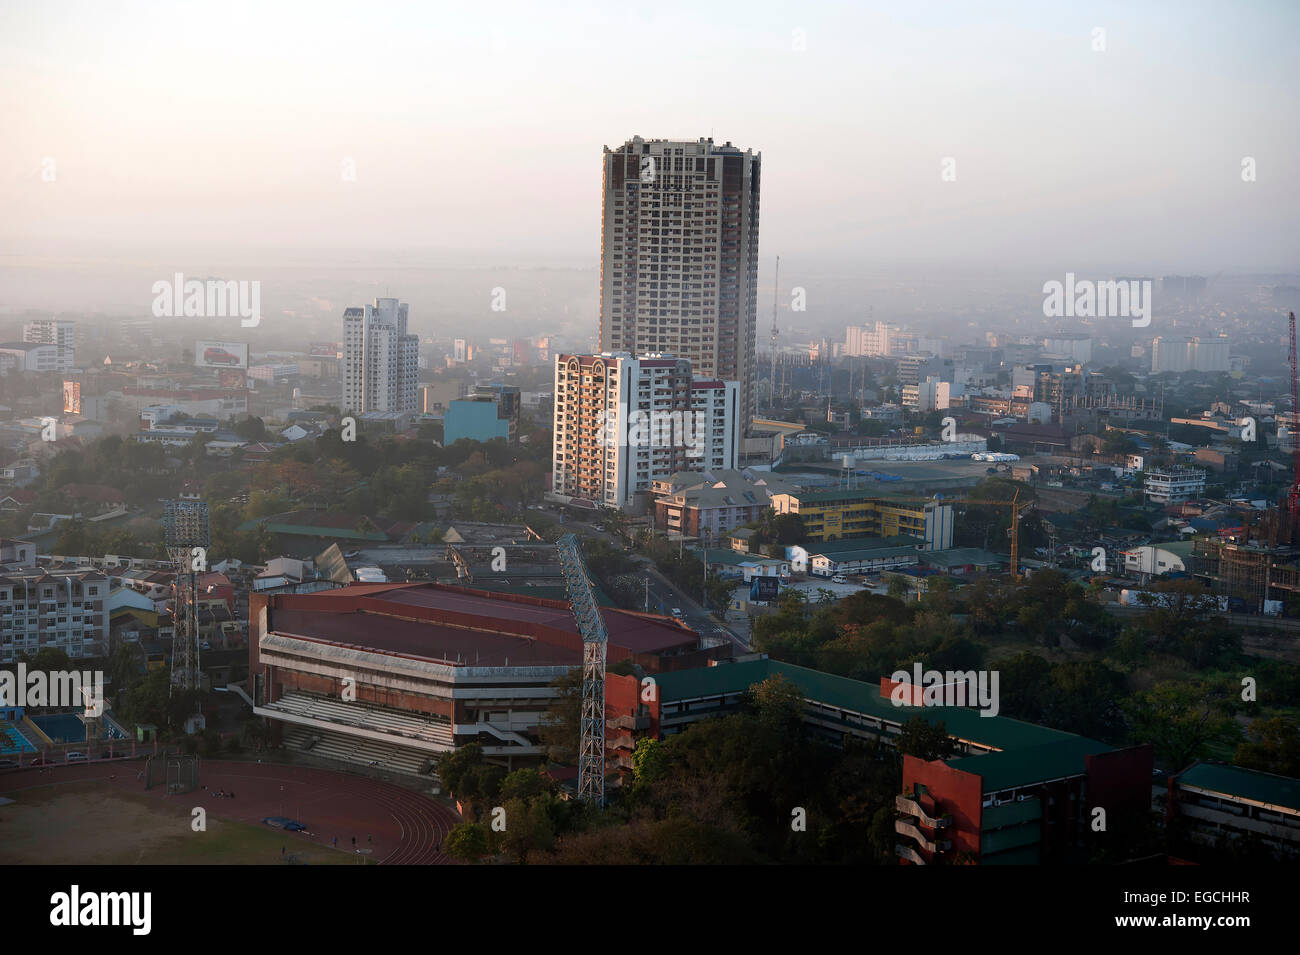 Pasig City, Metro Manila, Philippine Islands, South East Asia. - Stock Image